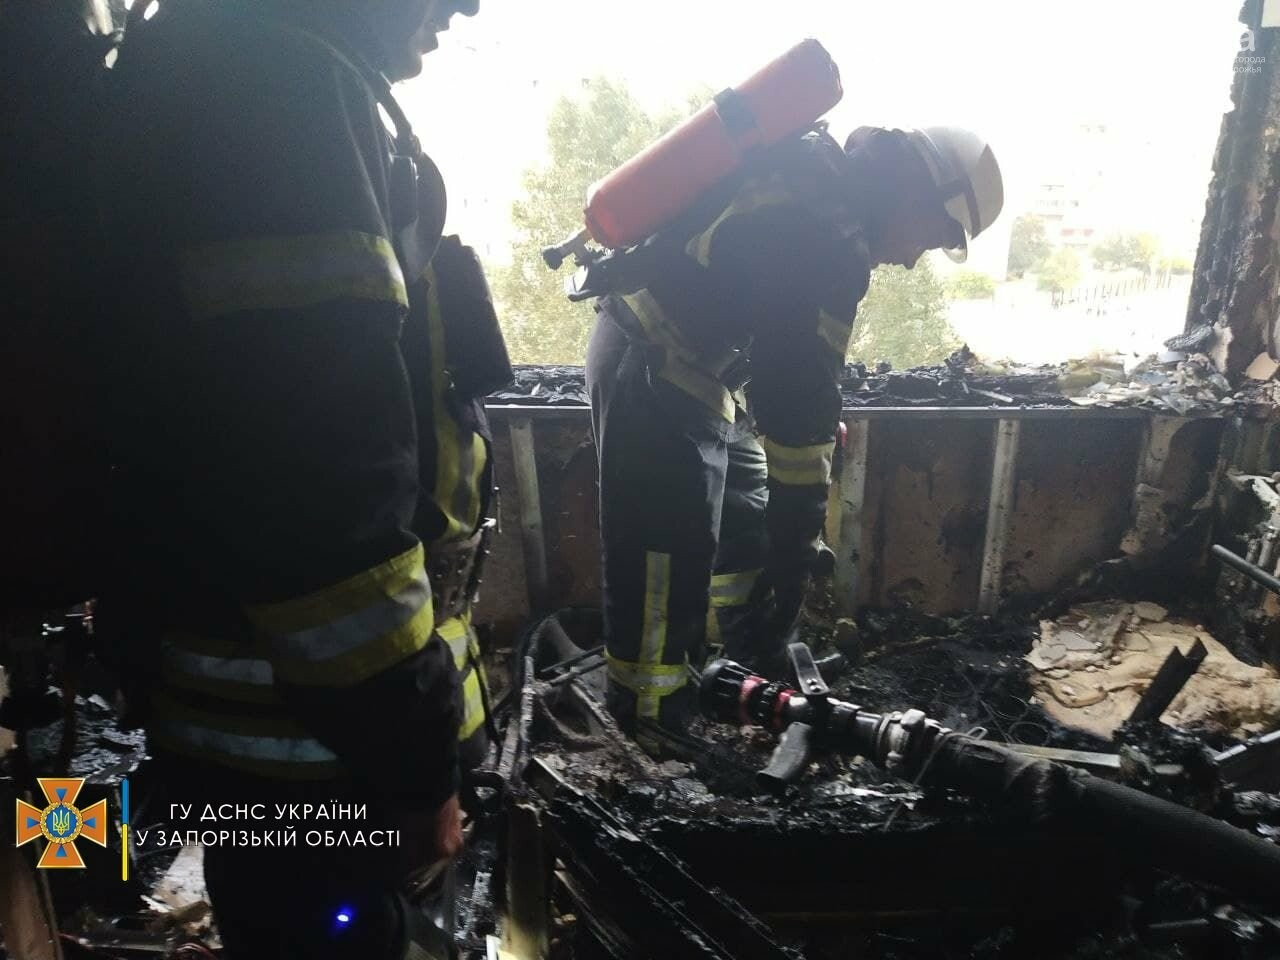 photo2021 09 1210 13 43result 613dd2369829e - В Запорожье 18 спасателей тушили пожар в девятиэтажке, - ФОТО